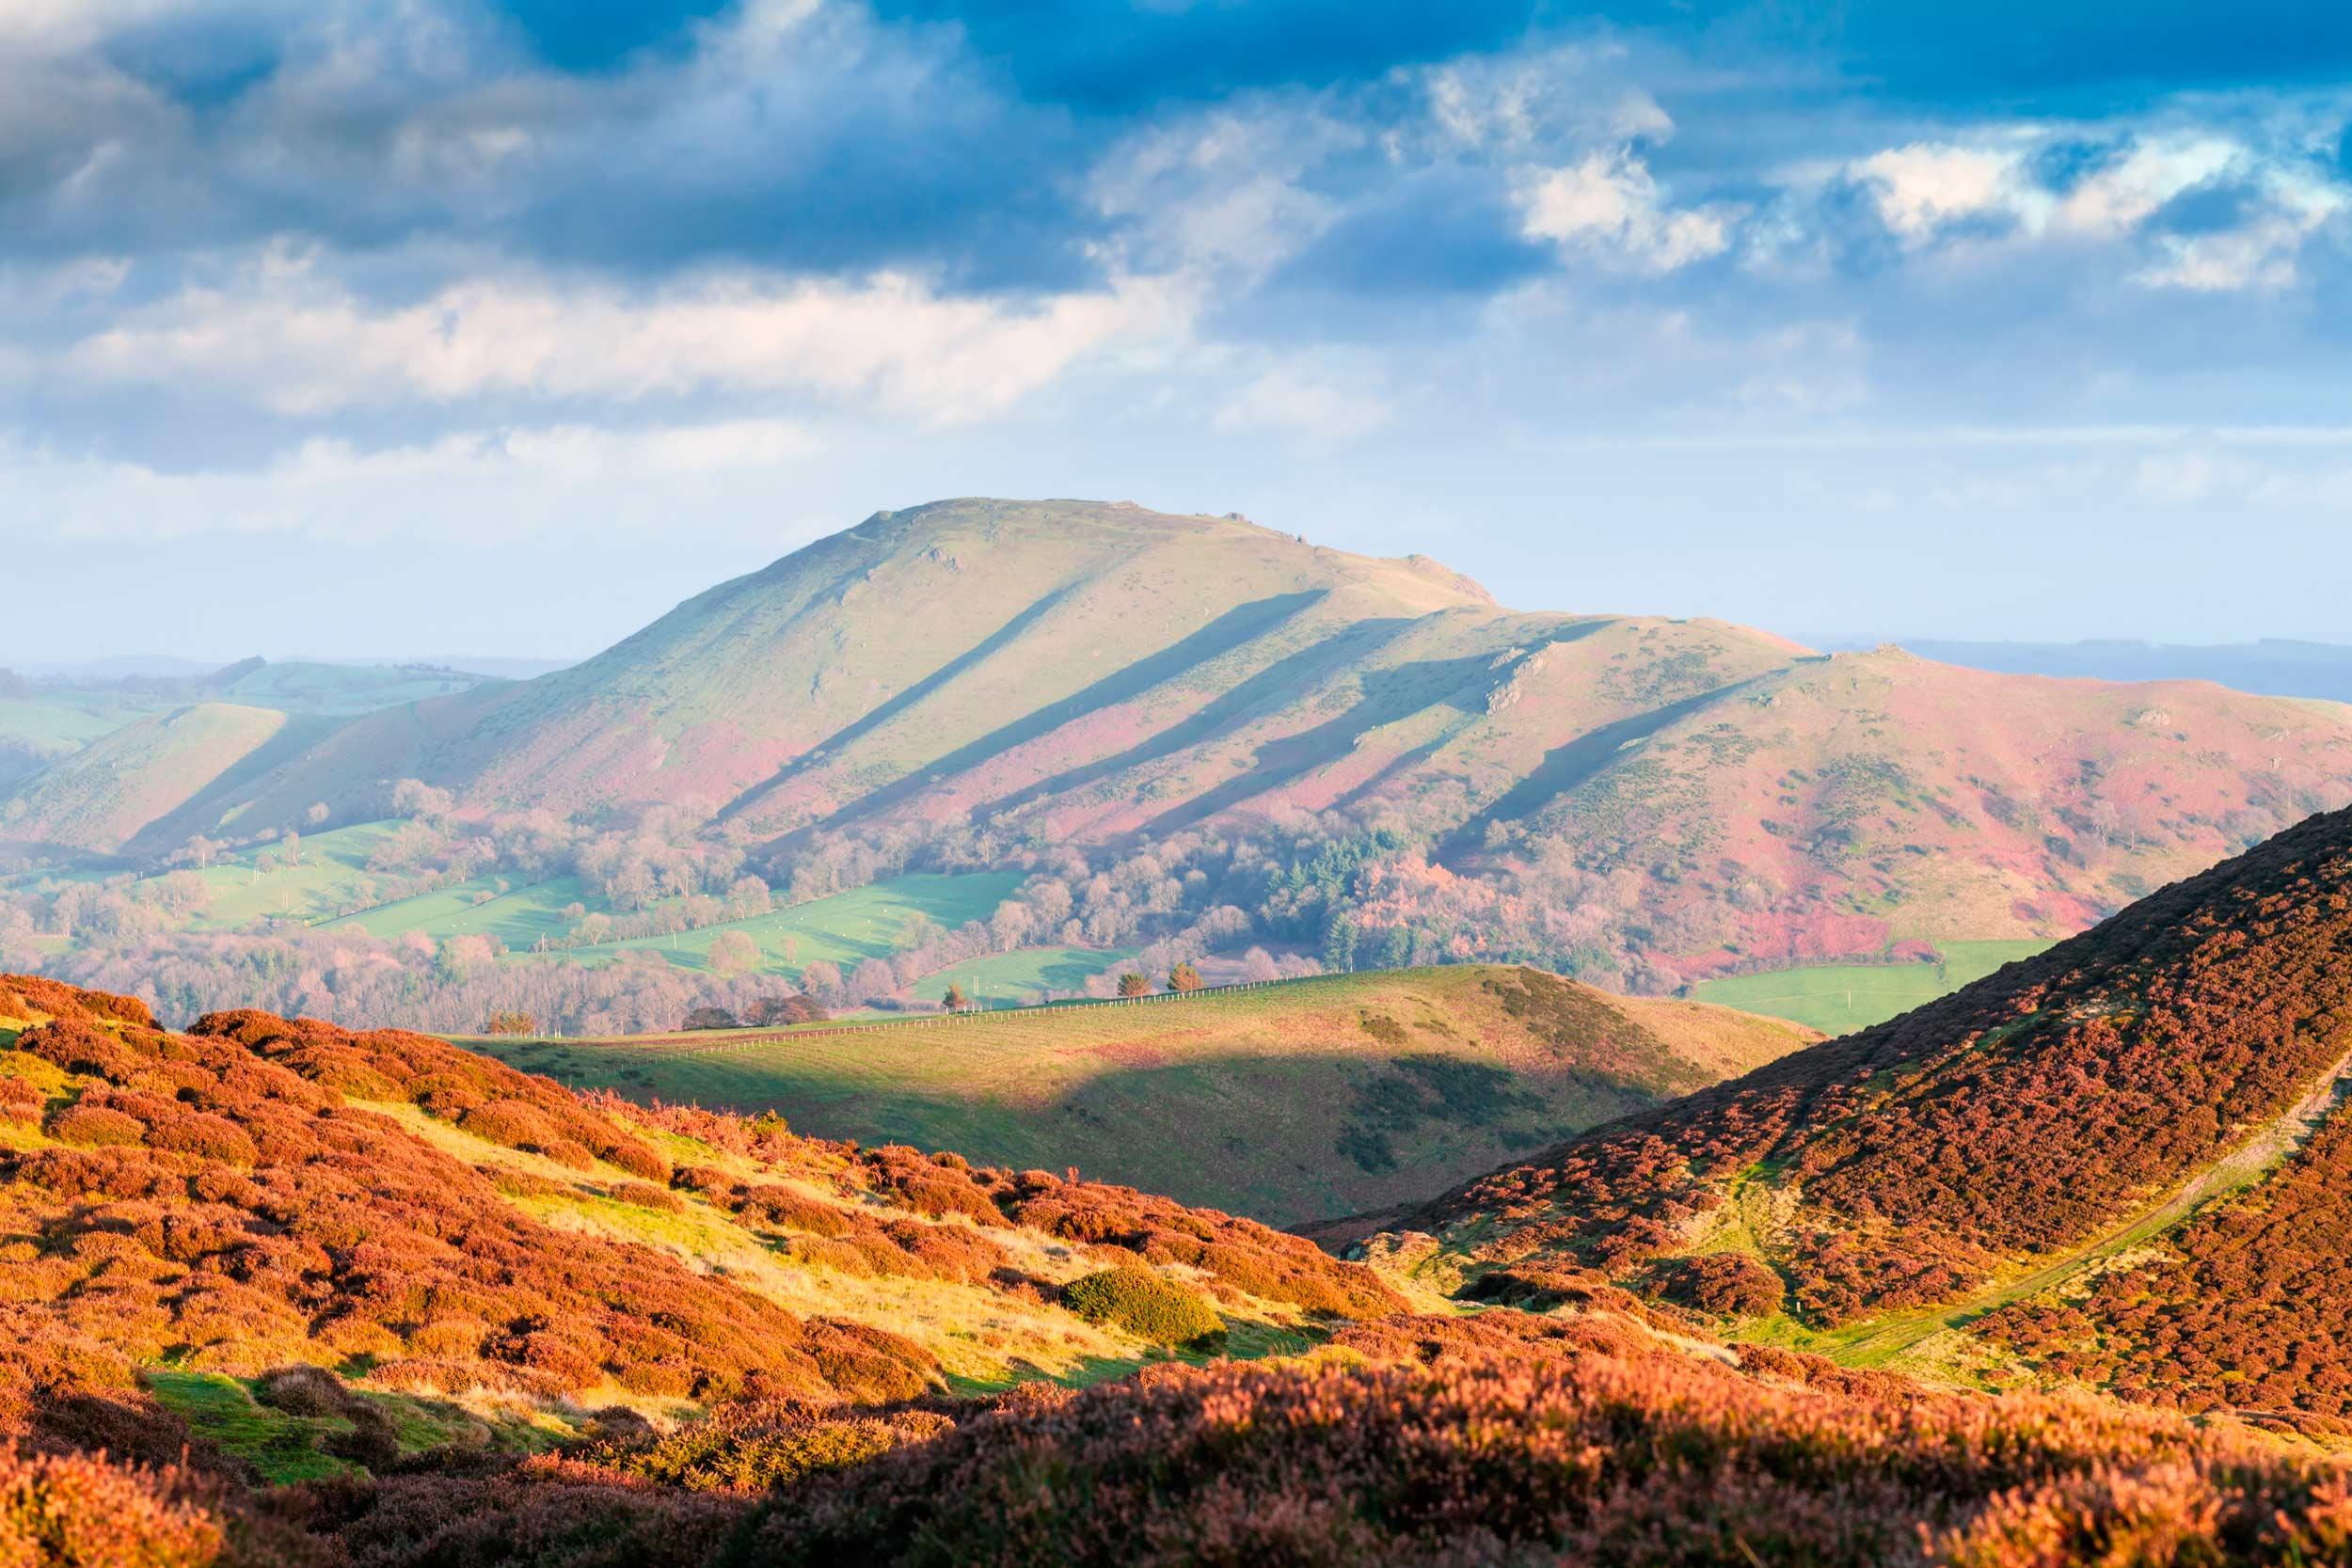 Carding Mill valley, Shropshire Hills, England  (EddieCloud/Shutterstock)